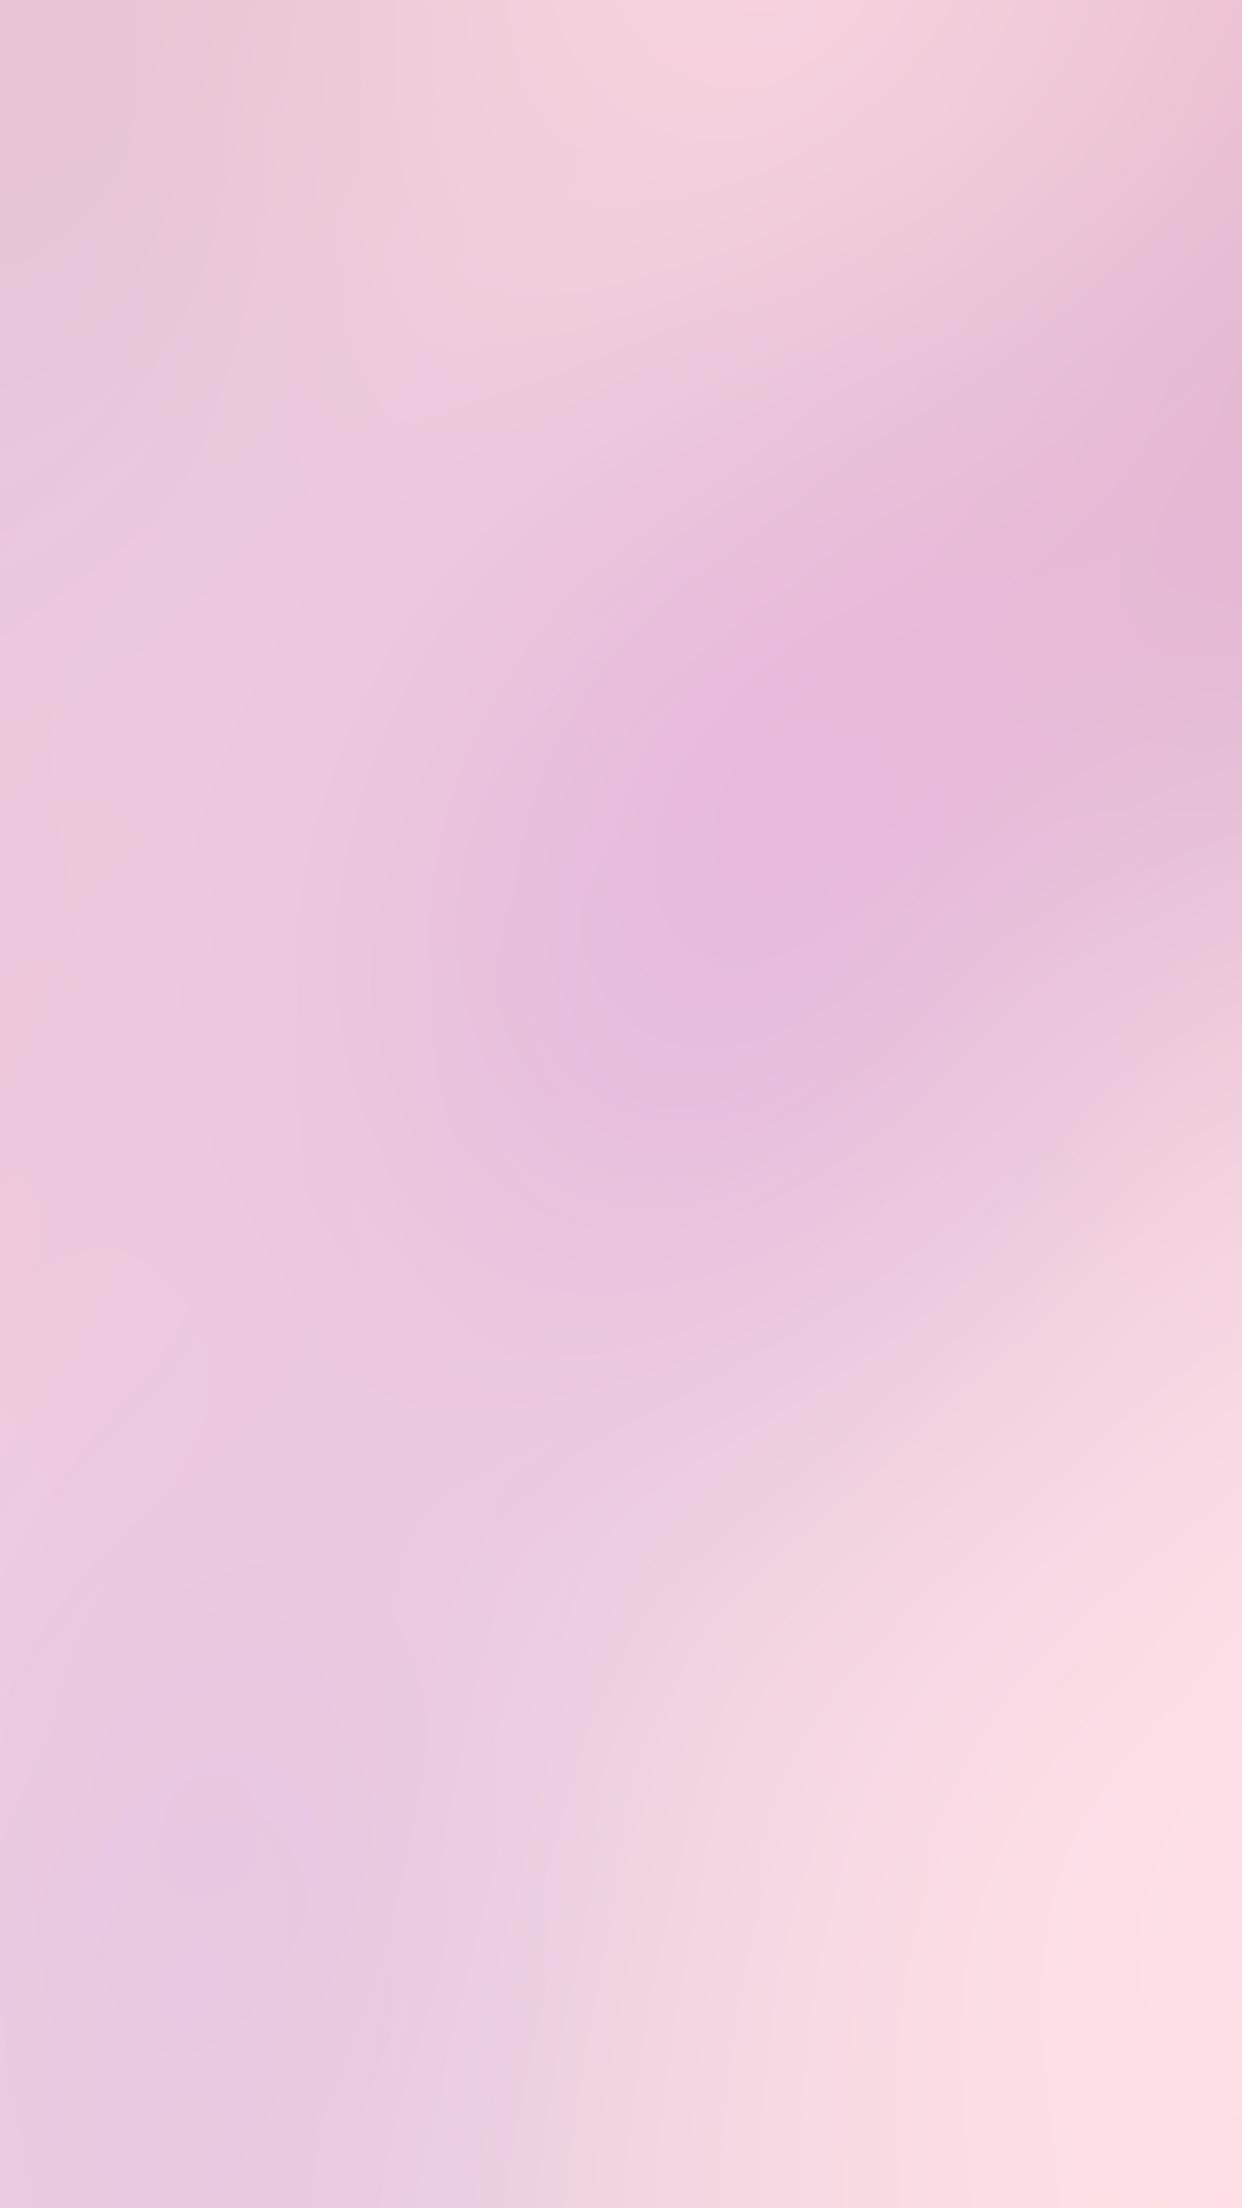 Pastel Pink Wallpaper Cute Si09 Soft Pink Baby Gradation Blur Wallpaper